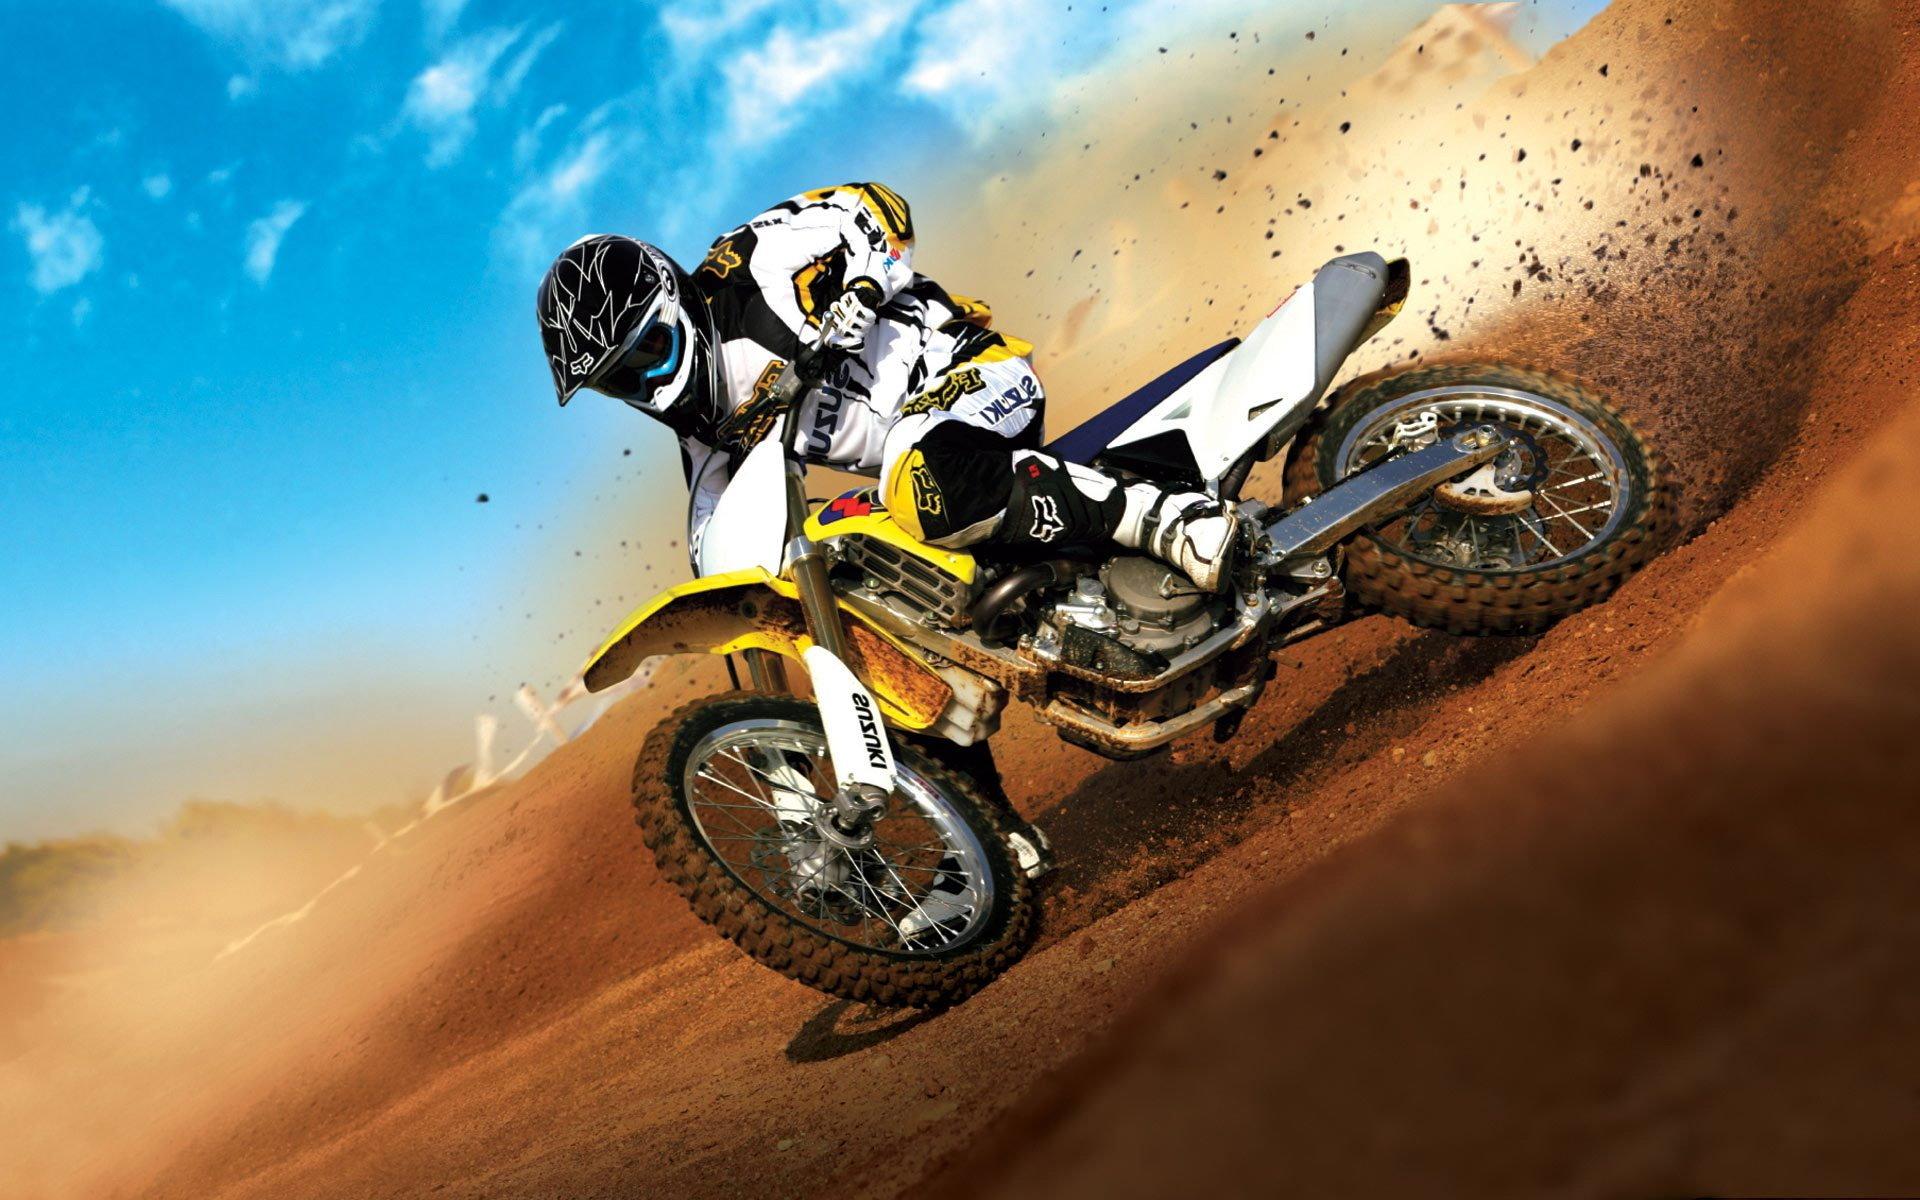 Motocross Wallpaper 1920x1200